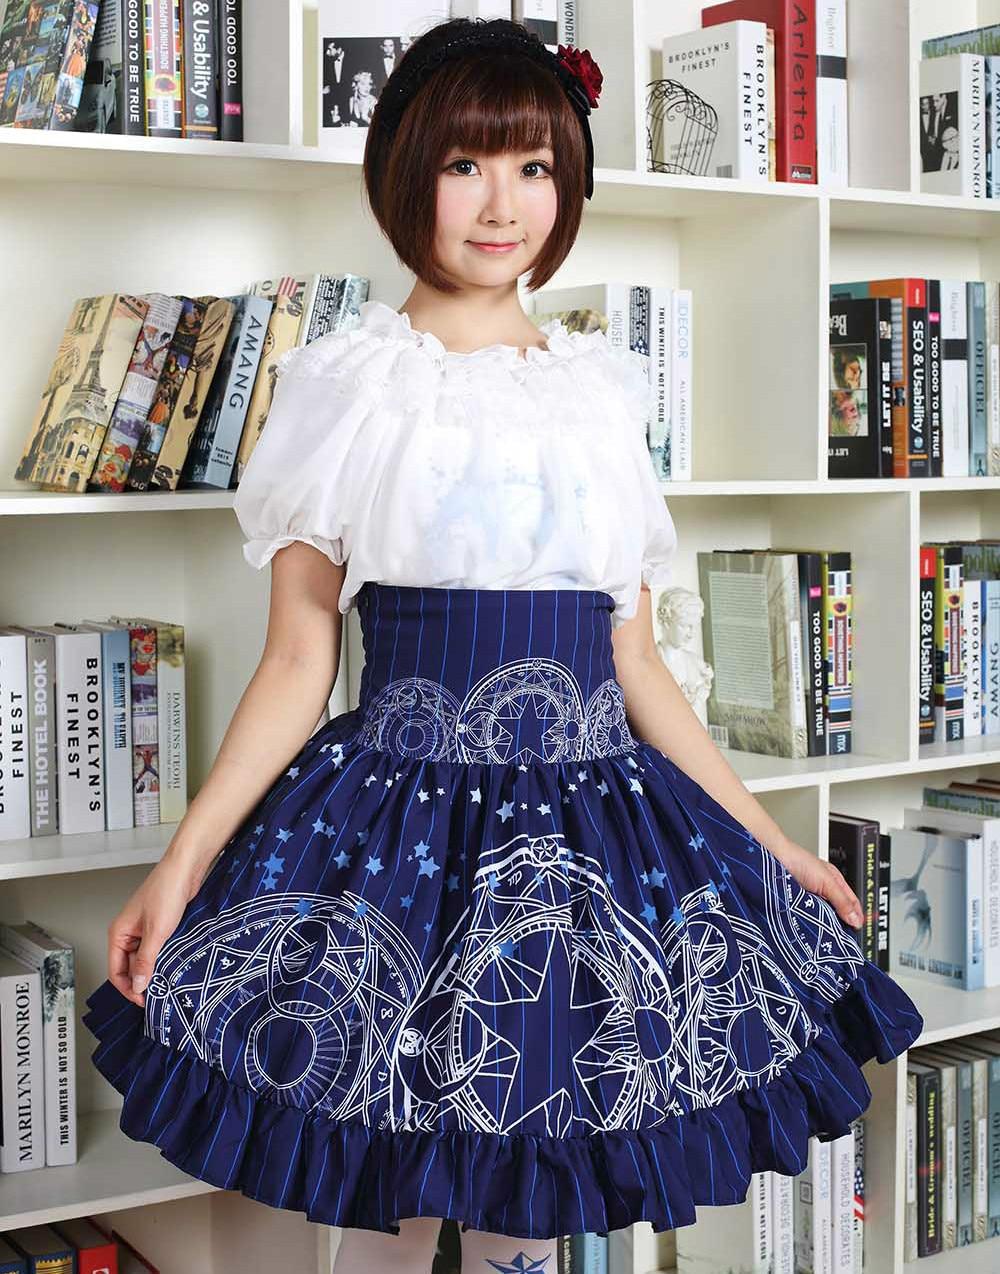 Magic юбка